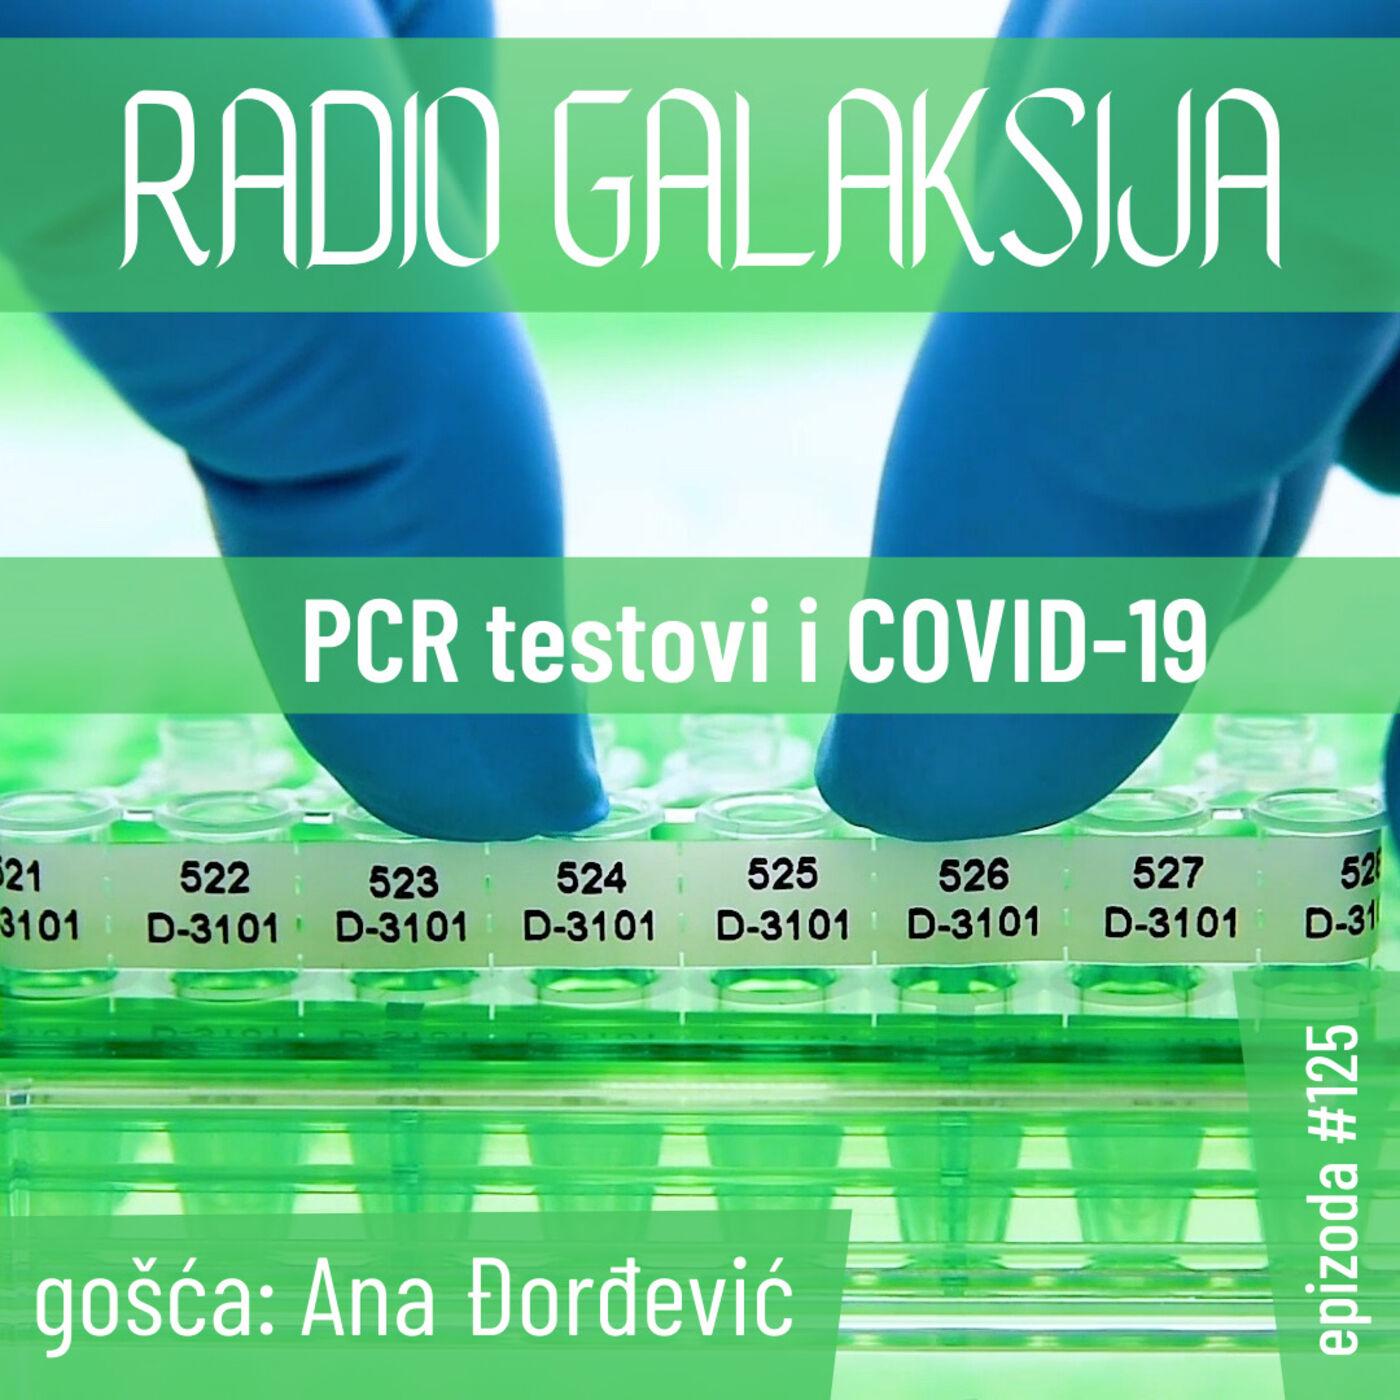 Radio Galaksija #125: PCR testovi i COVID-19 (Ana Đorđević) [06-04-2021]